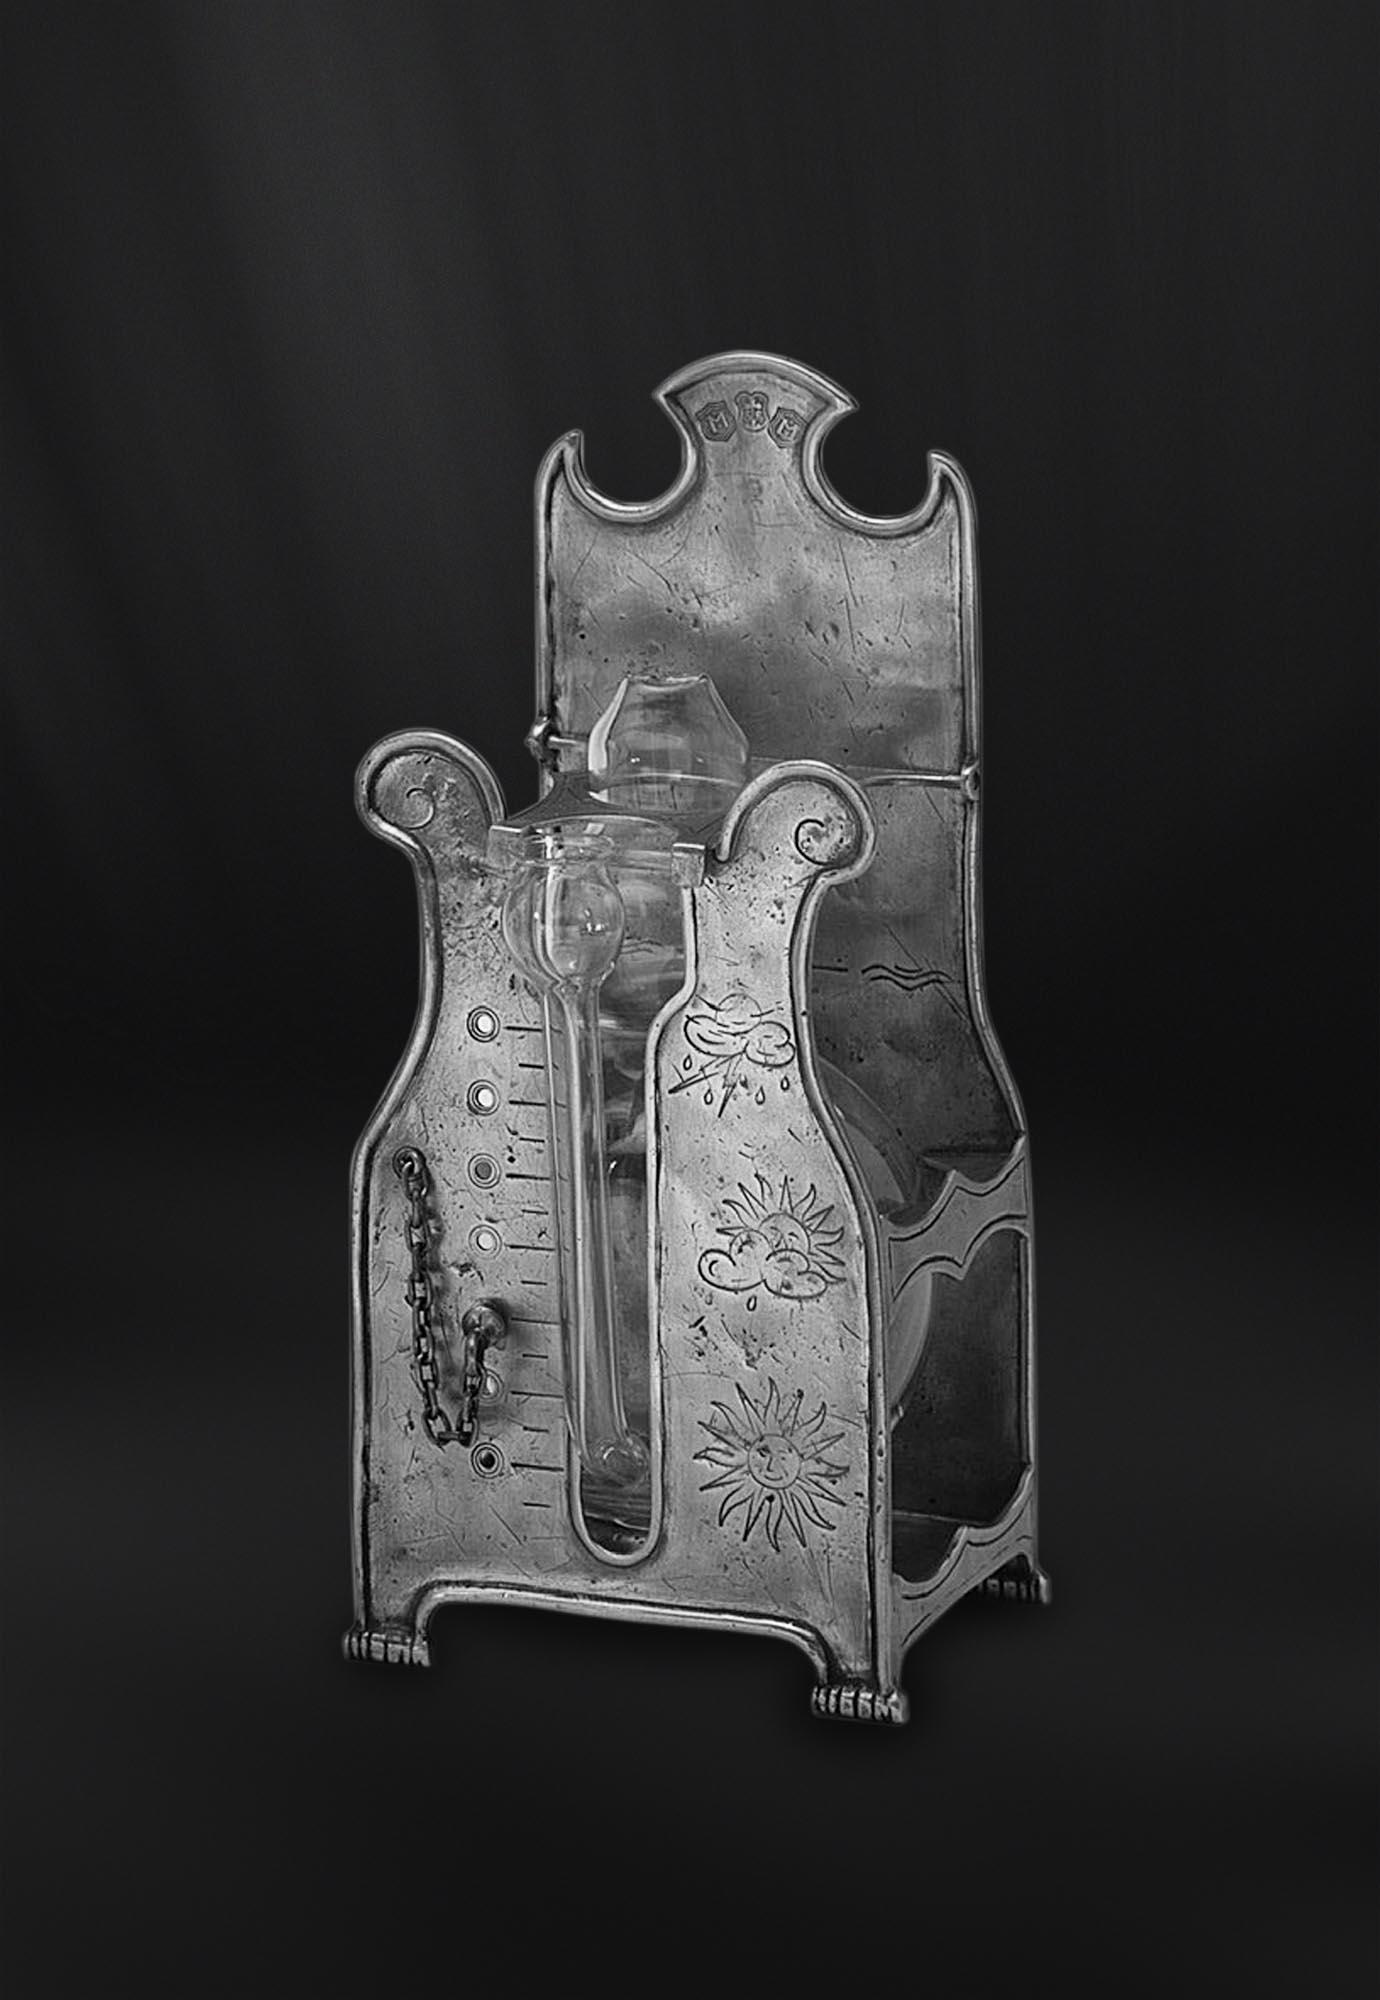 BAROMETRE etain antique